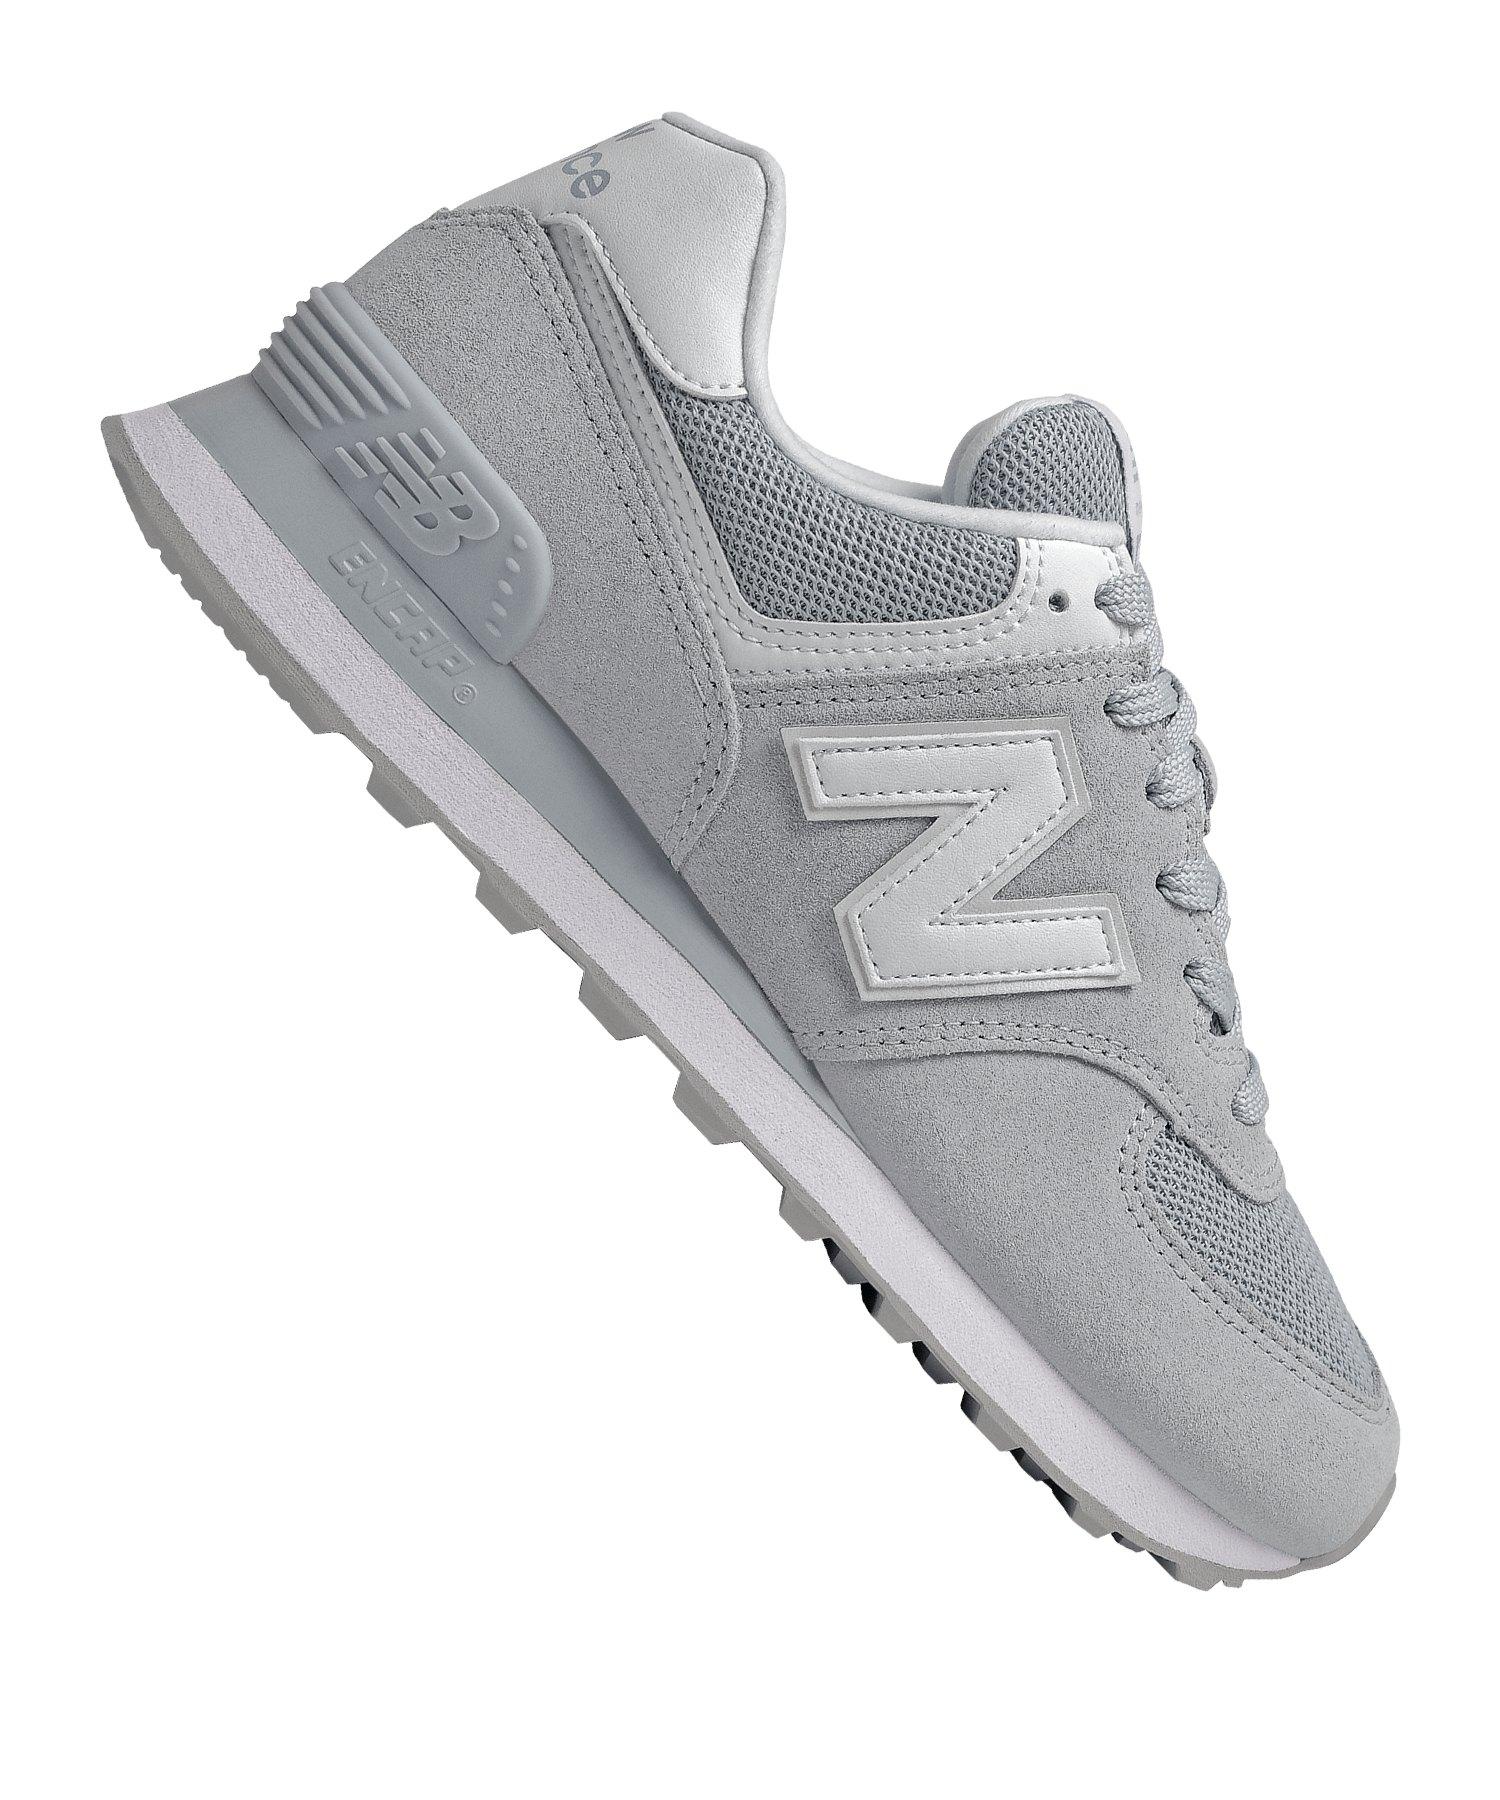 New Balance WL574 B Sneaker Damen Grau F12 - grau